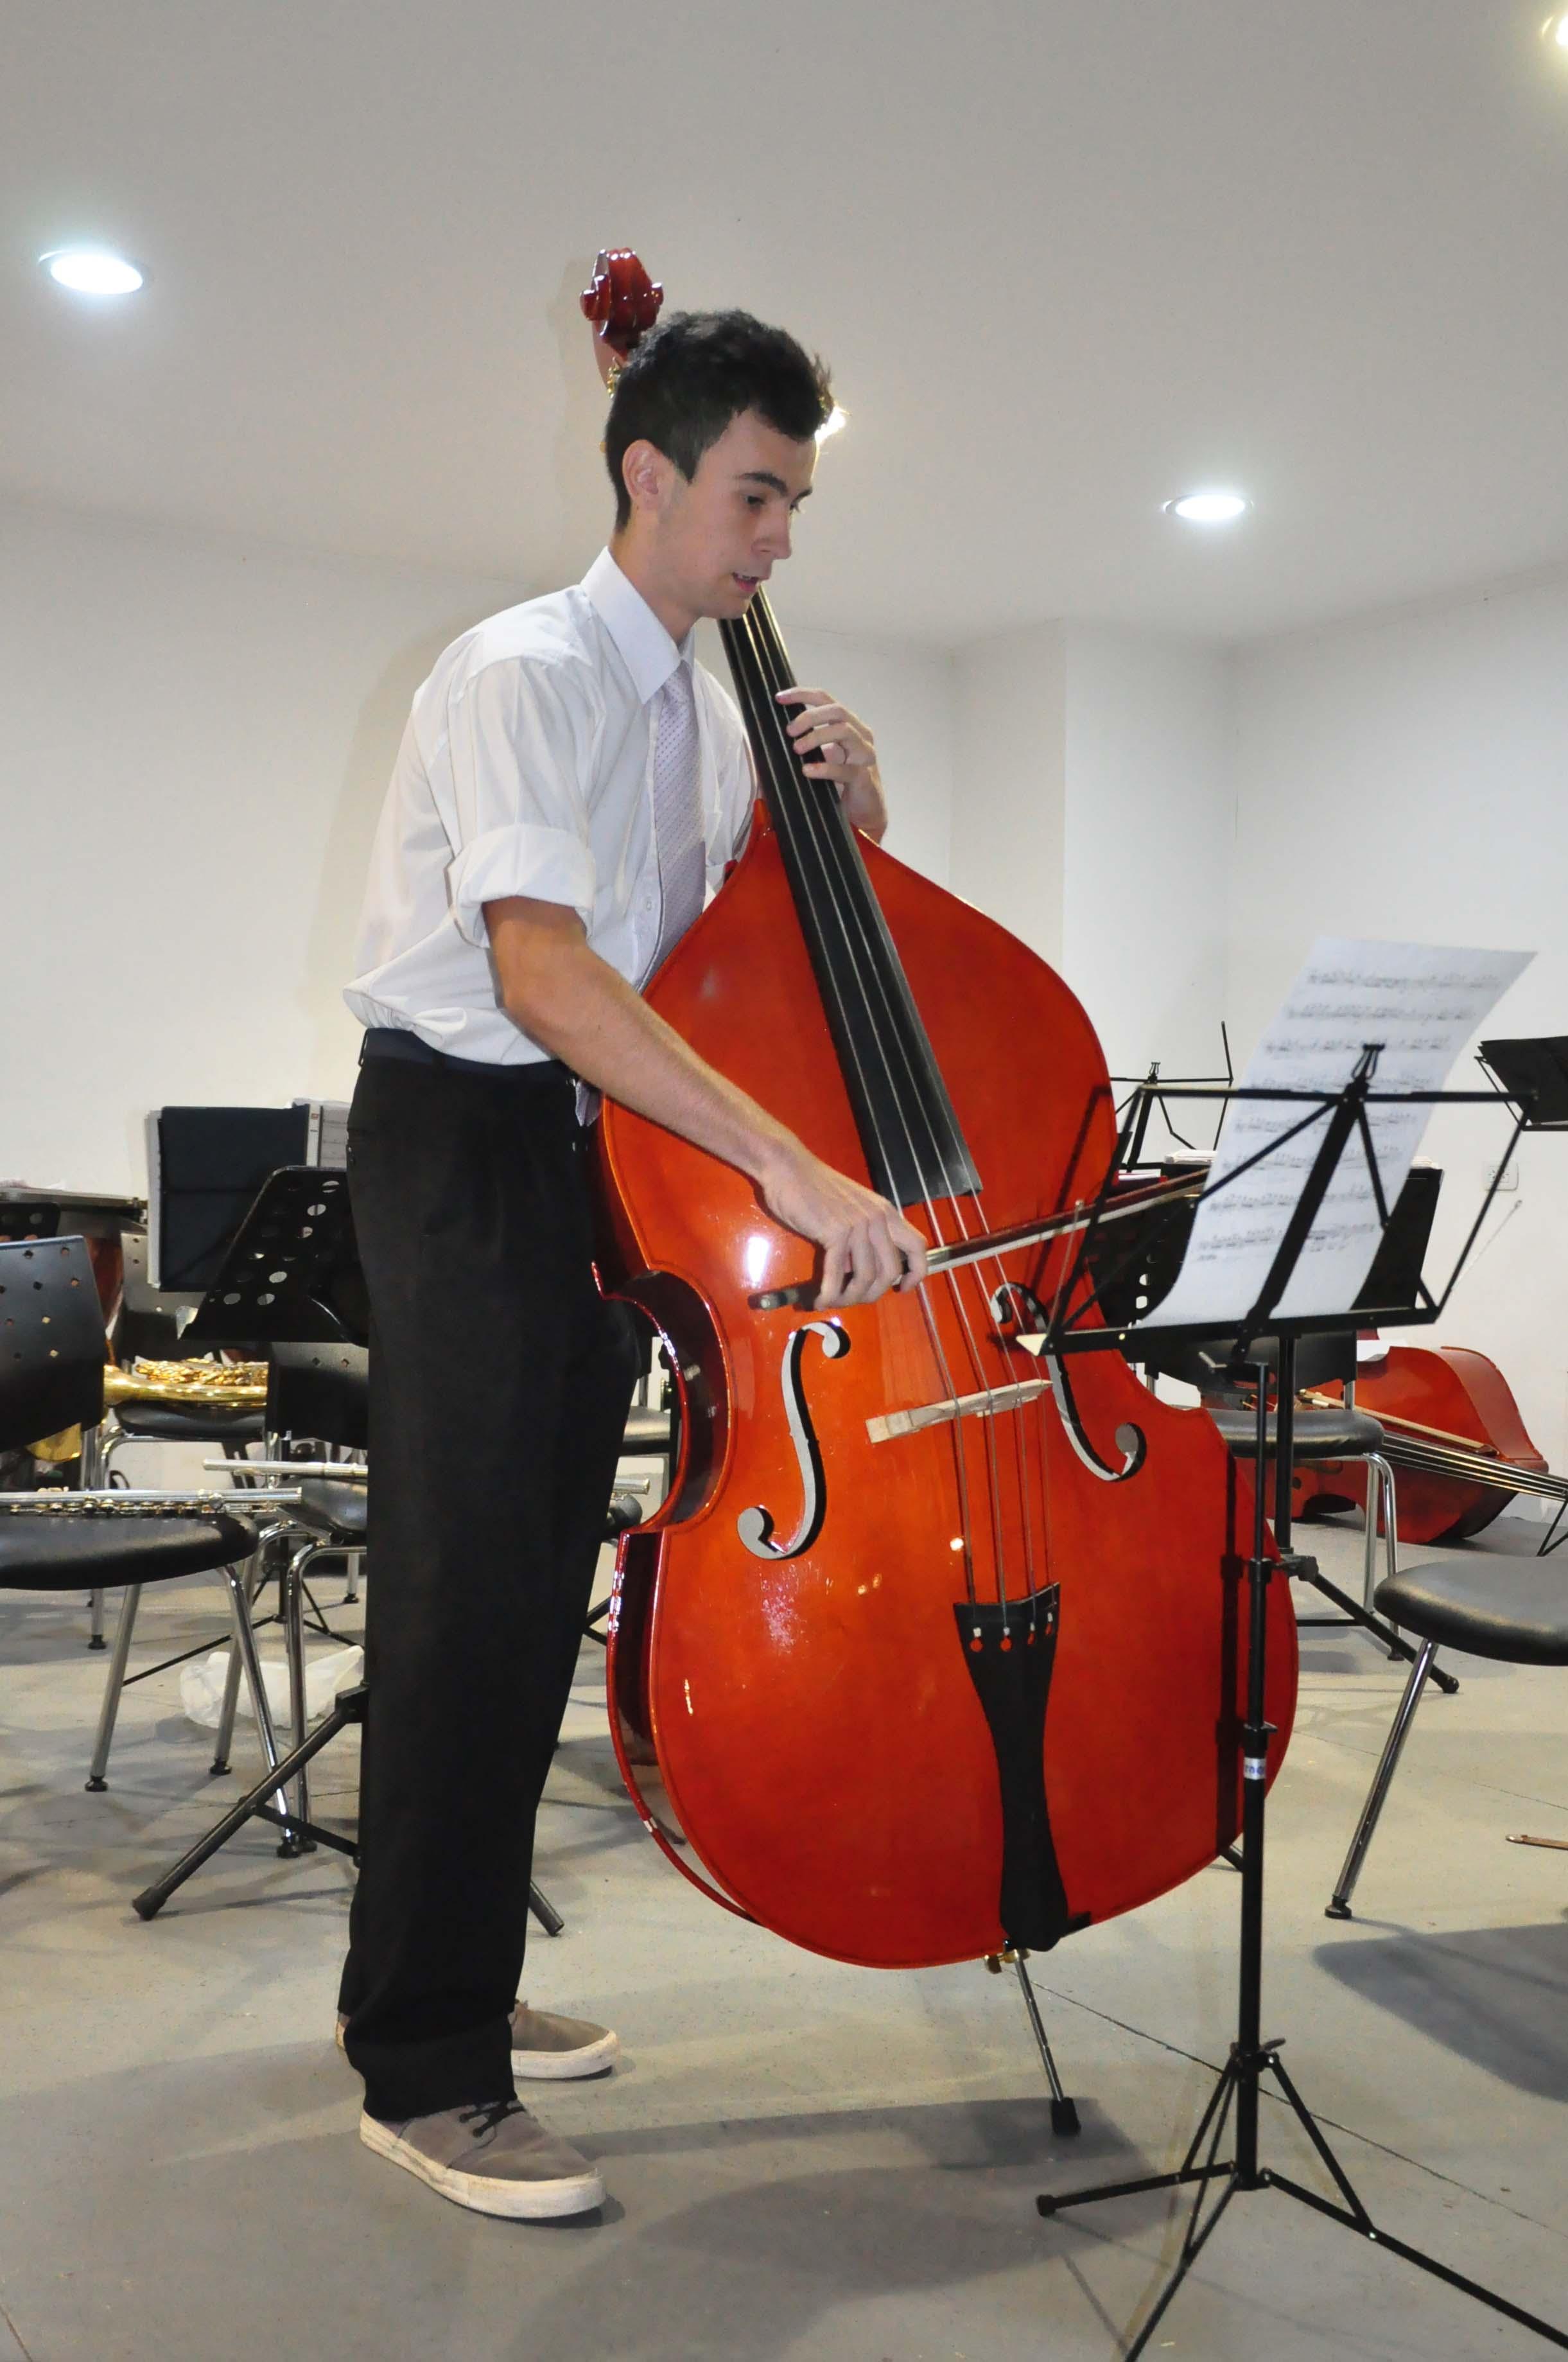 Orquesta en Escuela de Música - diciembre 2015